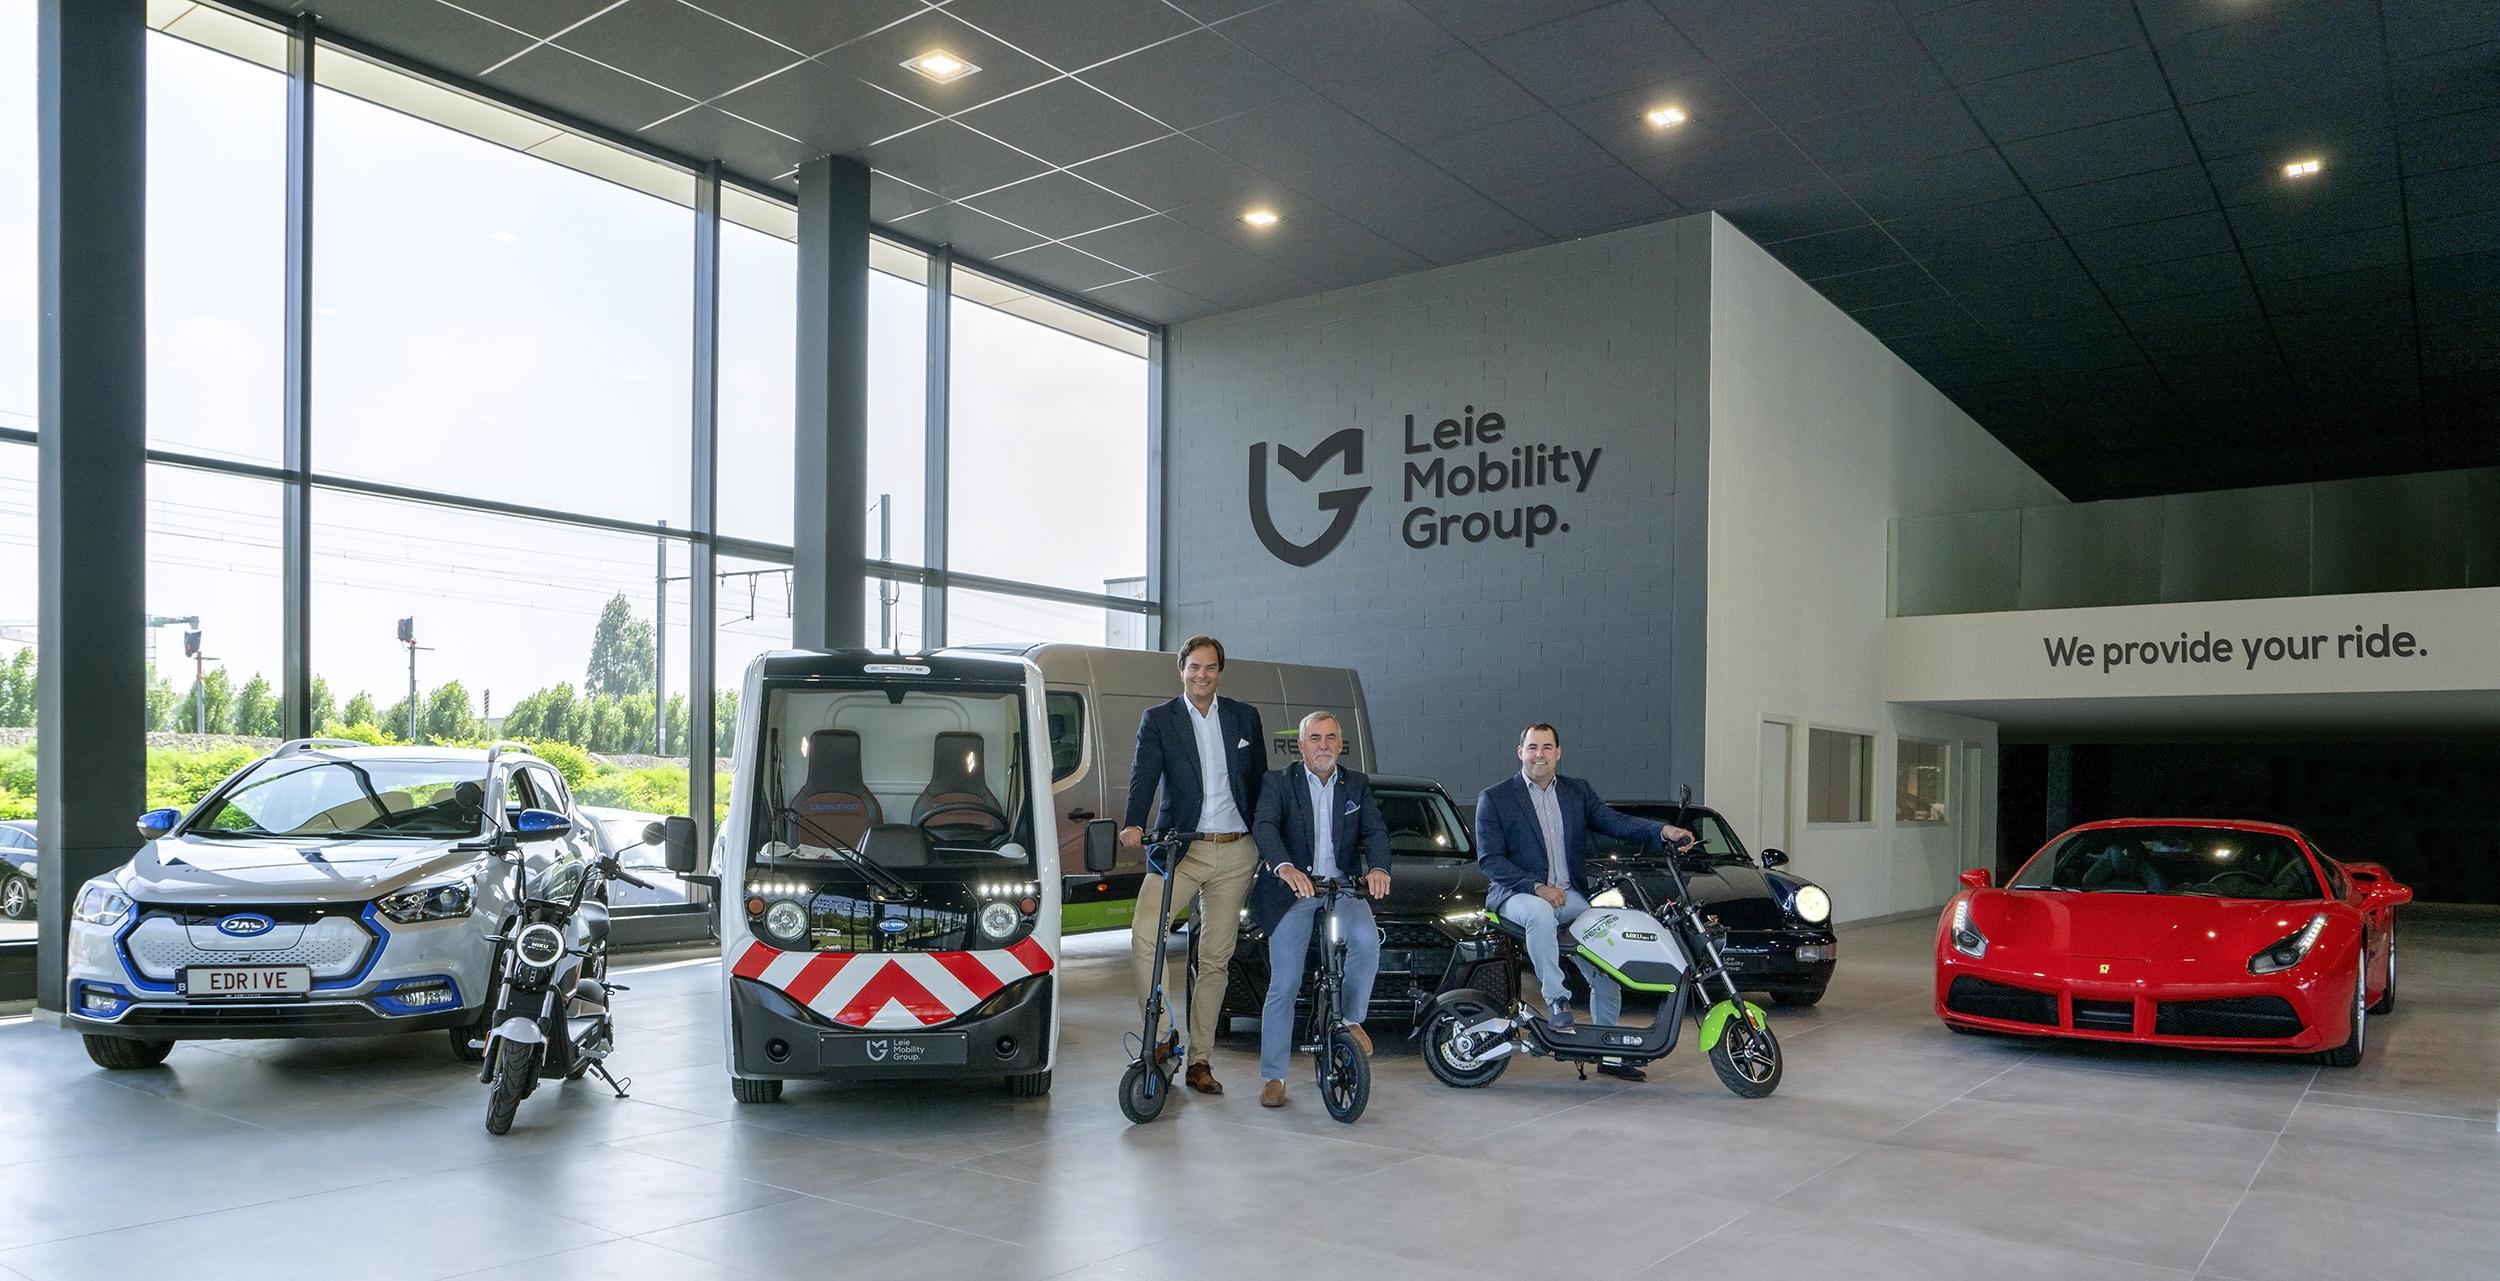 Intense samenwerking creëert de opmerkelijke Automotive Holding,             Leie Mobility Group.